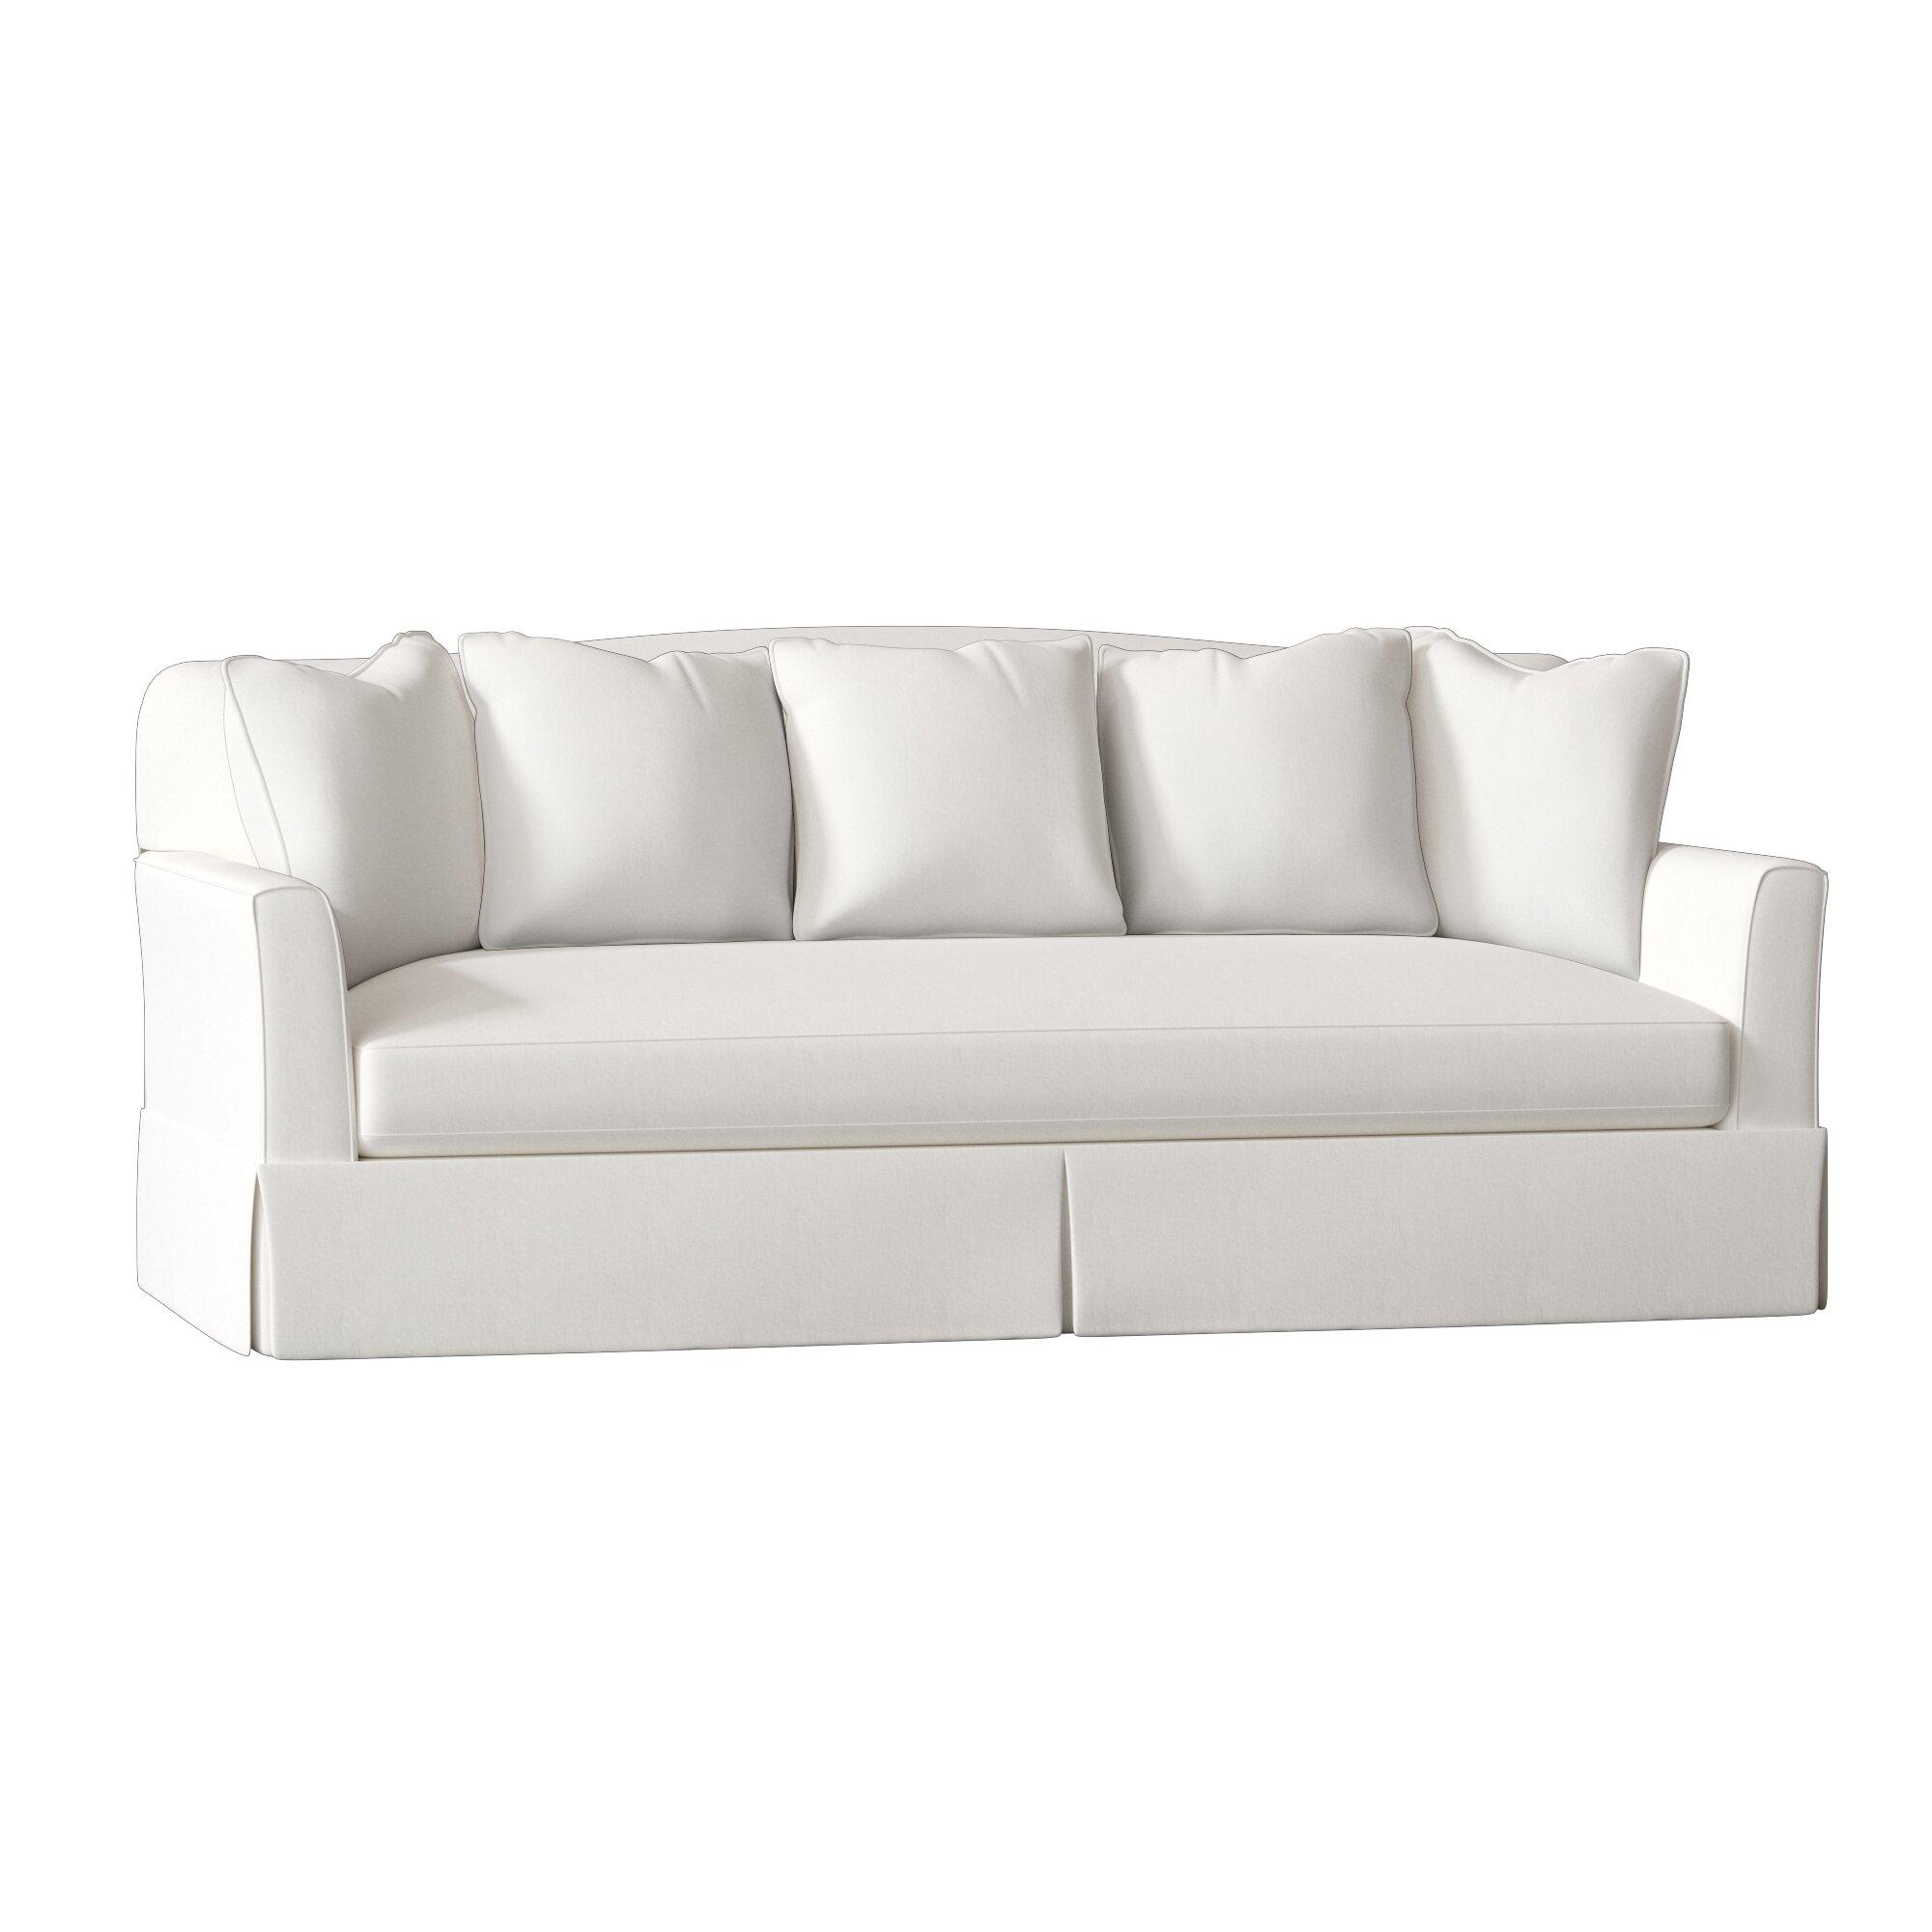 Fairchild 90 Flared Arm Sofa Reviews